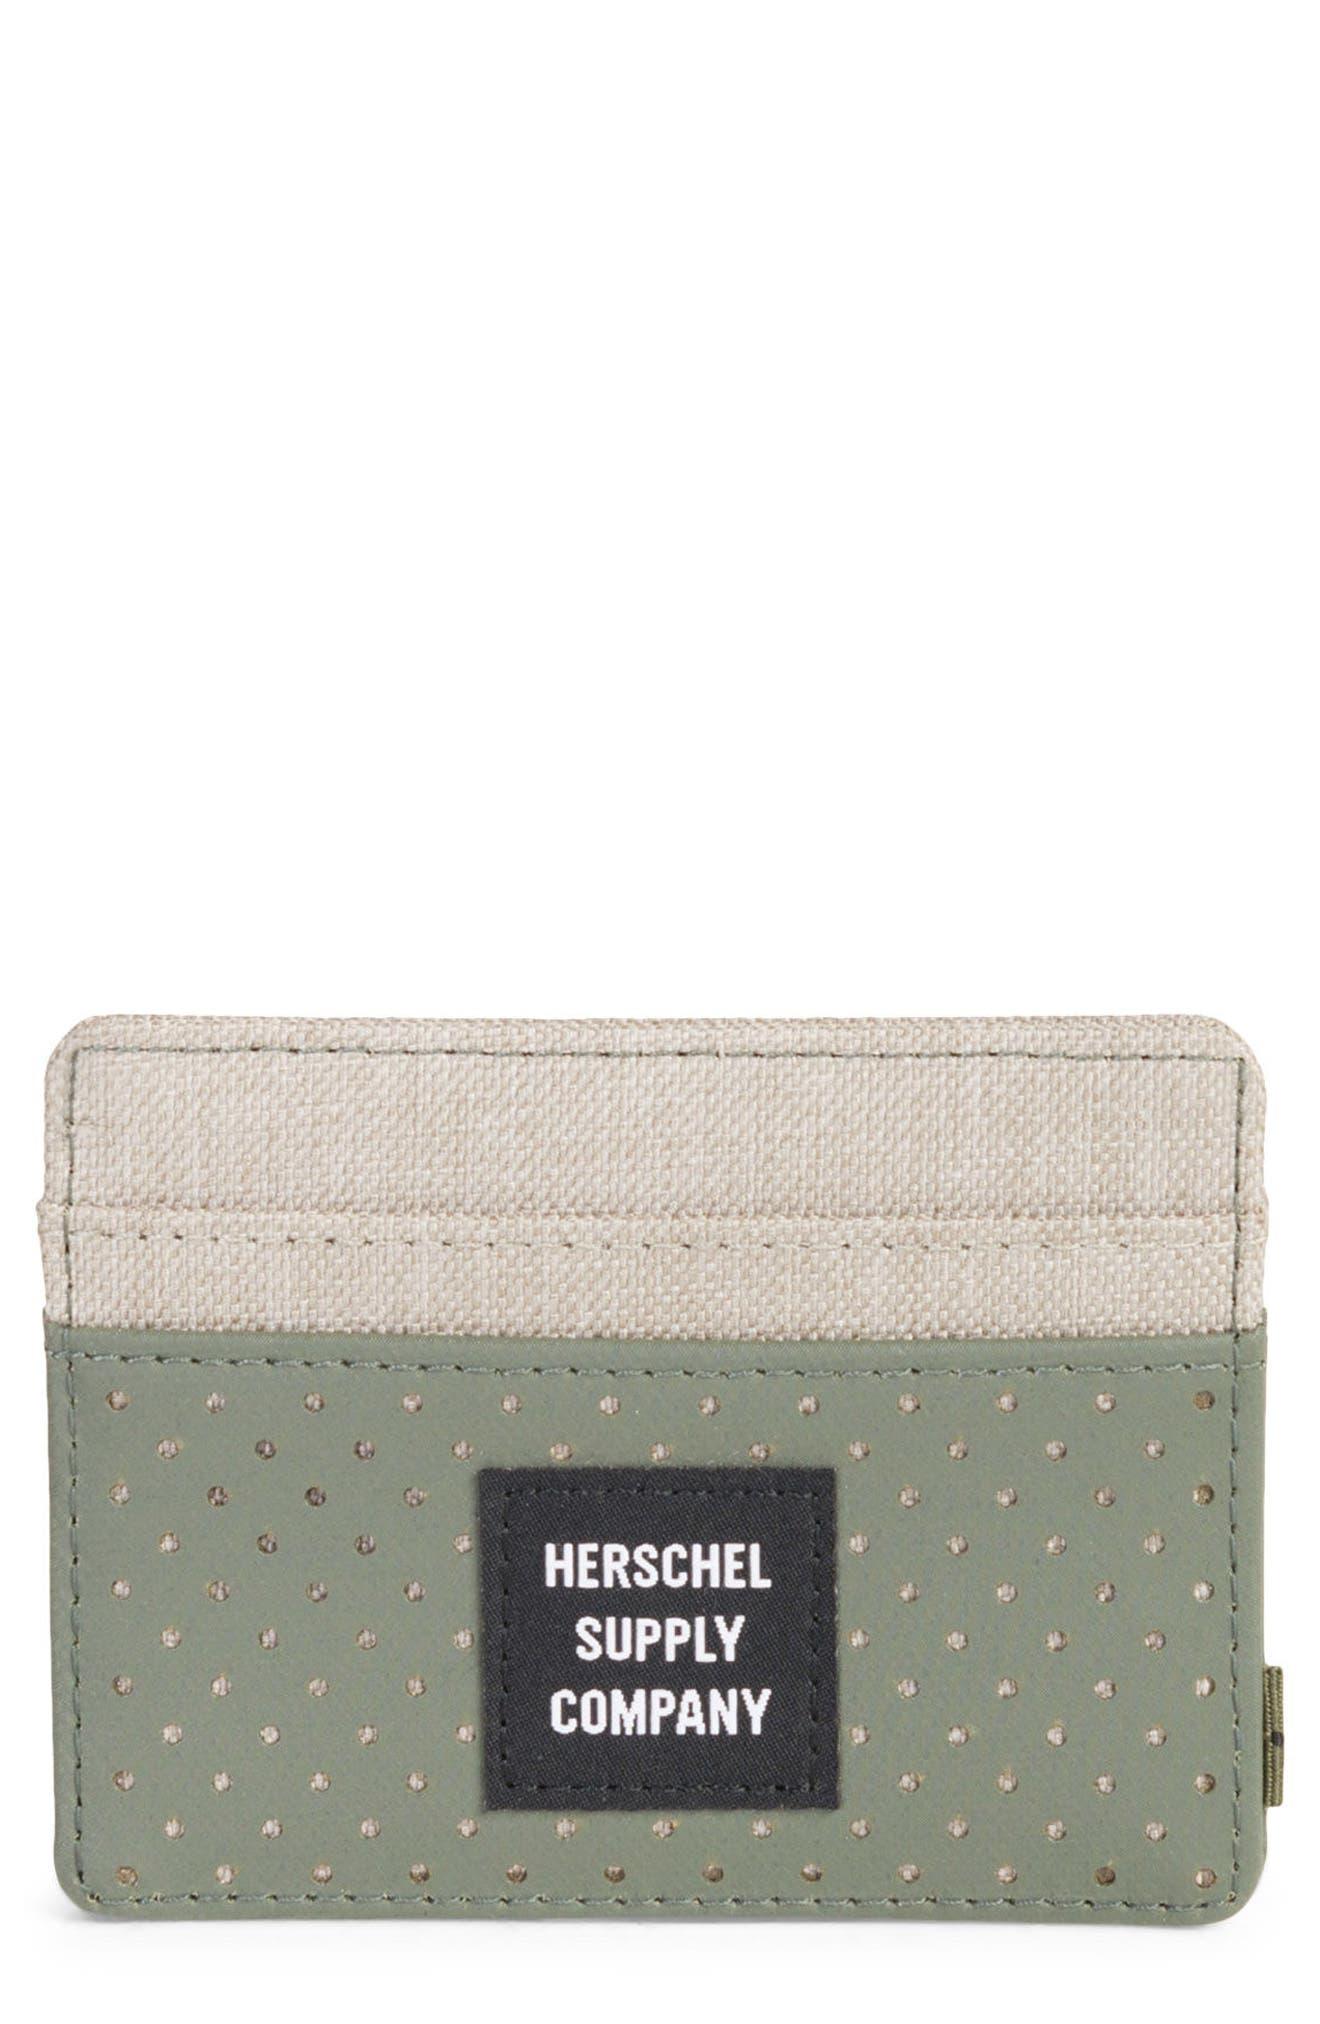 Herschel Supply Co. Charlie Aspect Card Case